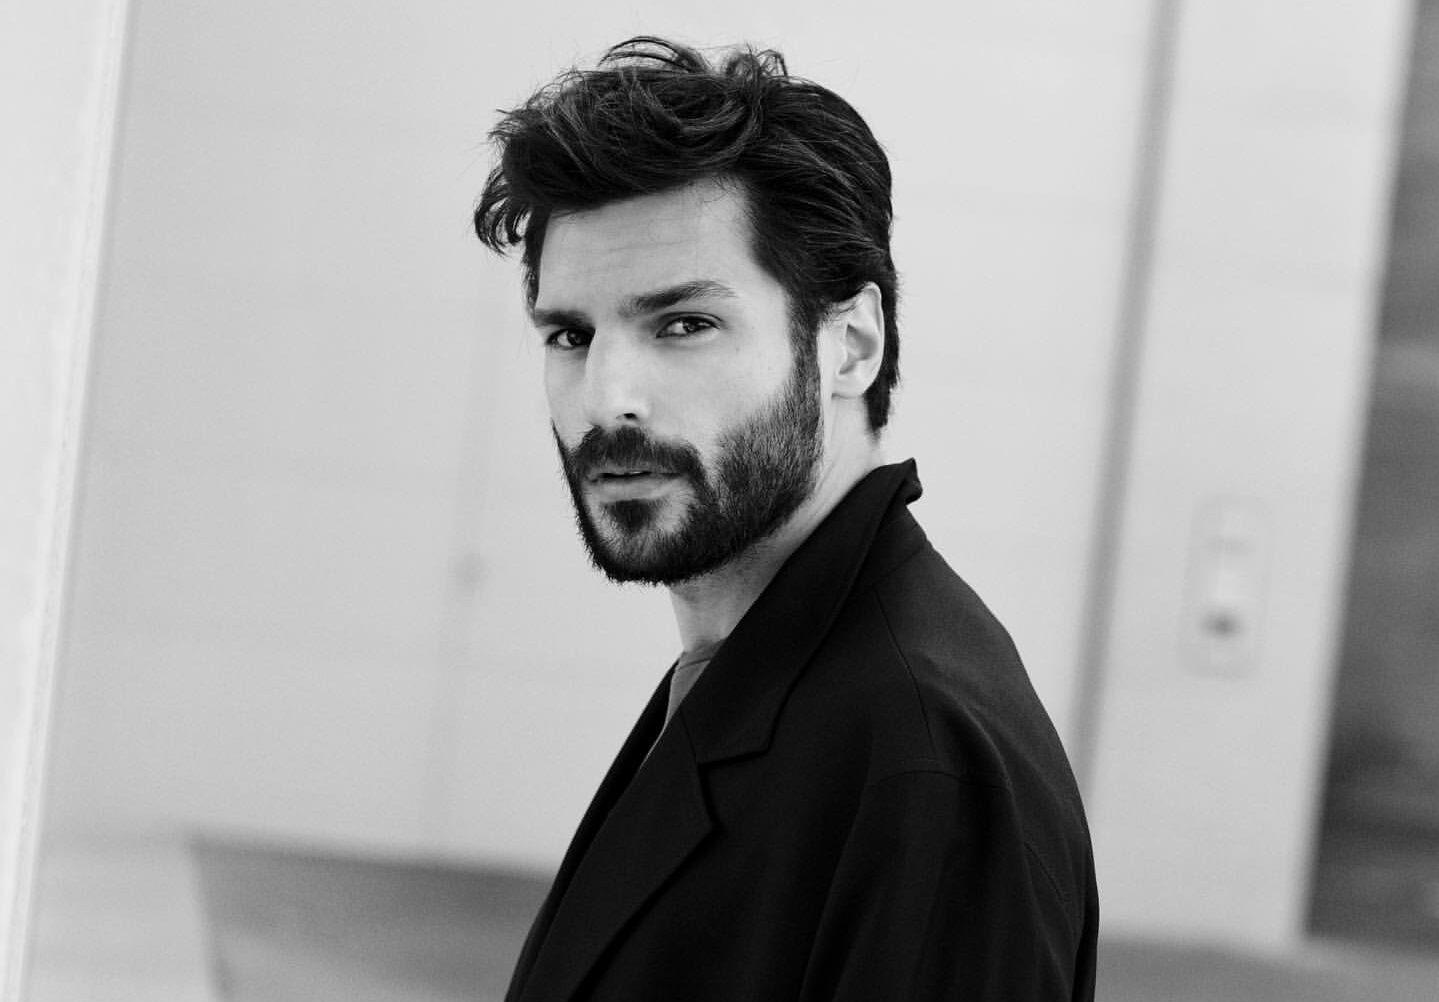 34-year-old Turkish actor Serkan Cayoglu is 1.88 meters tall and 85 kilograms